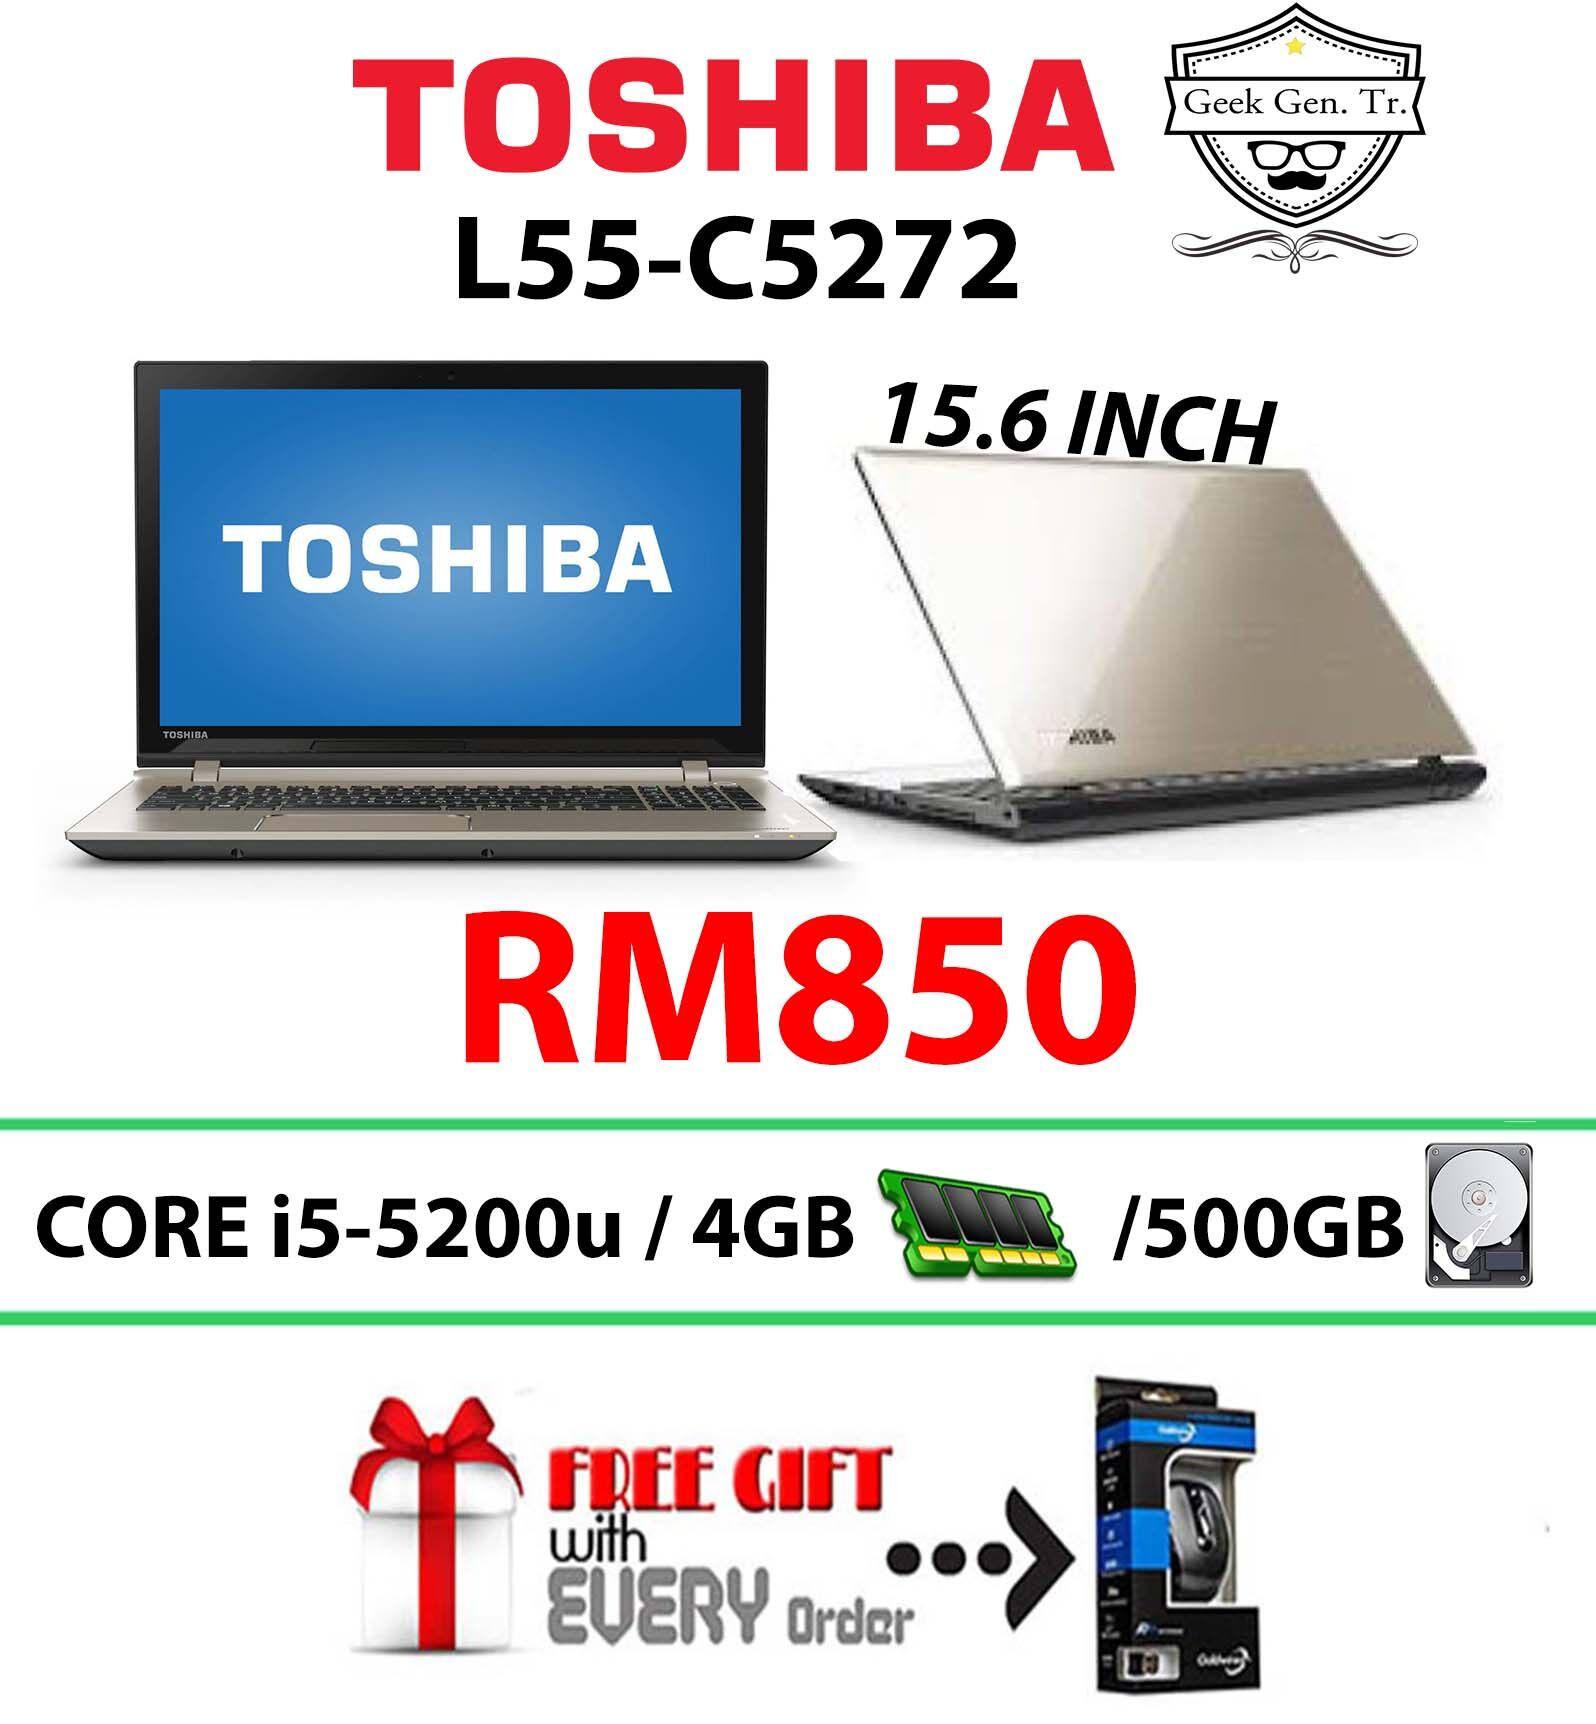 TOSHIBA L55-C5272 CORE i5-5200u 4GB RAM 500GB HDD 15.6 INCH Malaysia